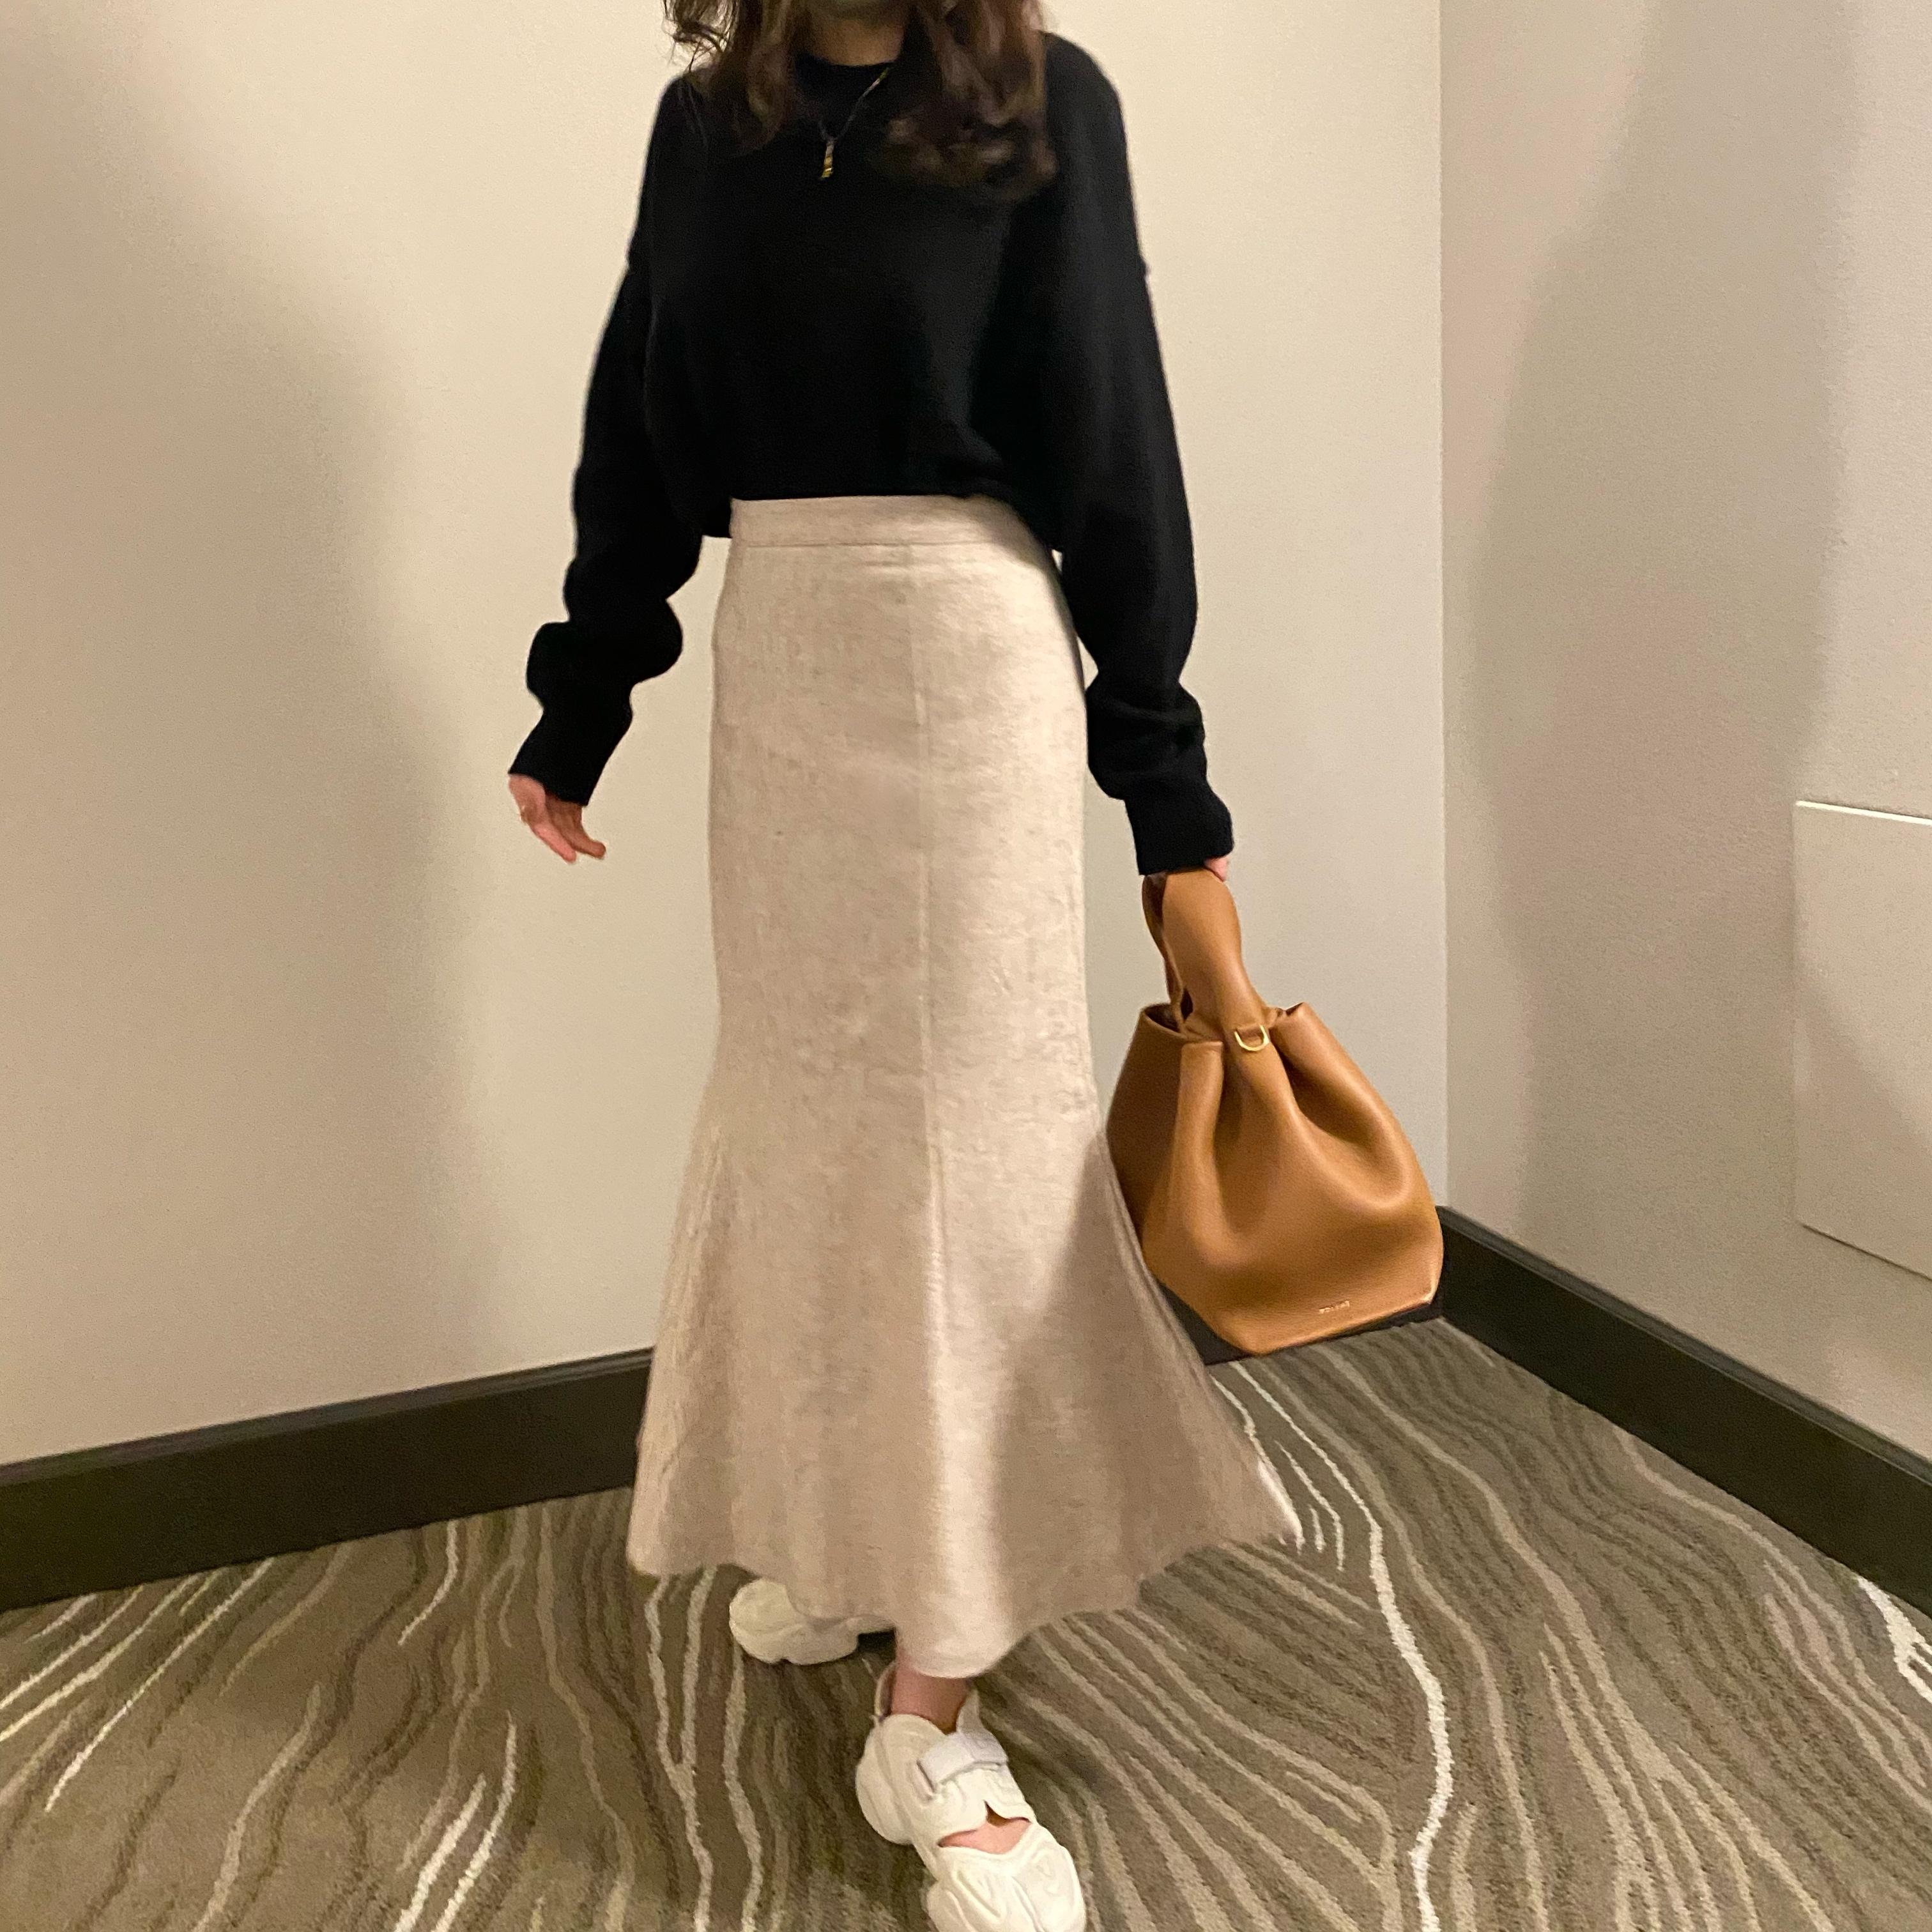 【4/18締】DAYNYC mermaid skirt (ivory)